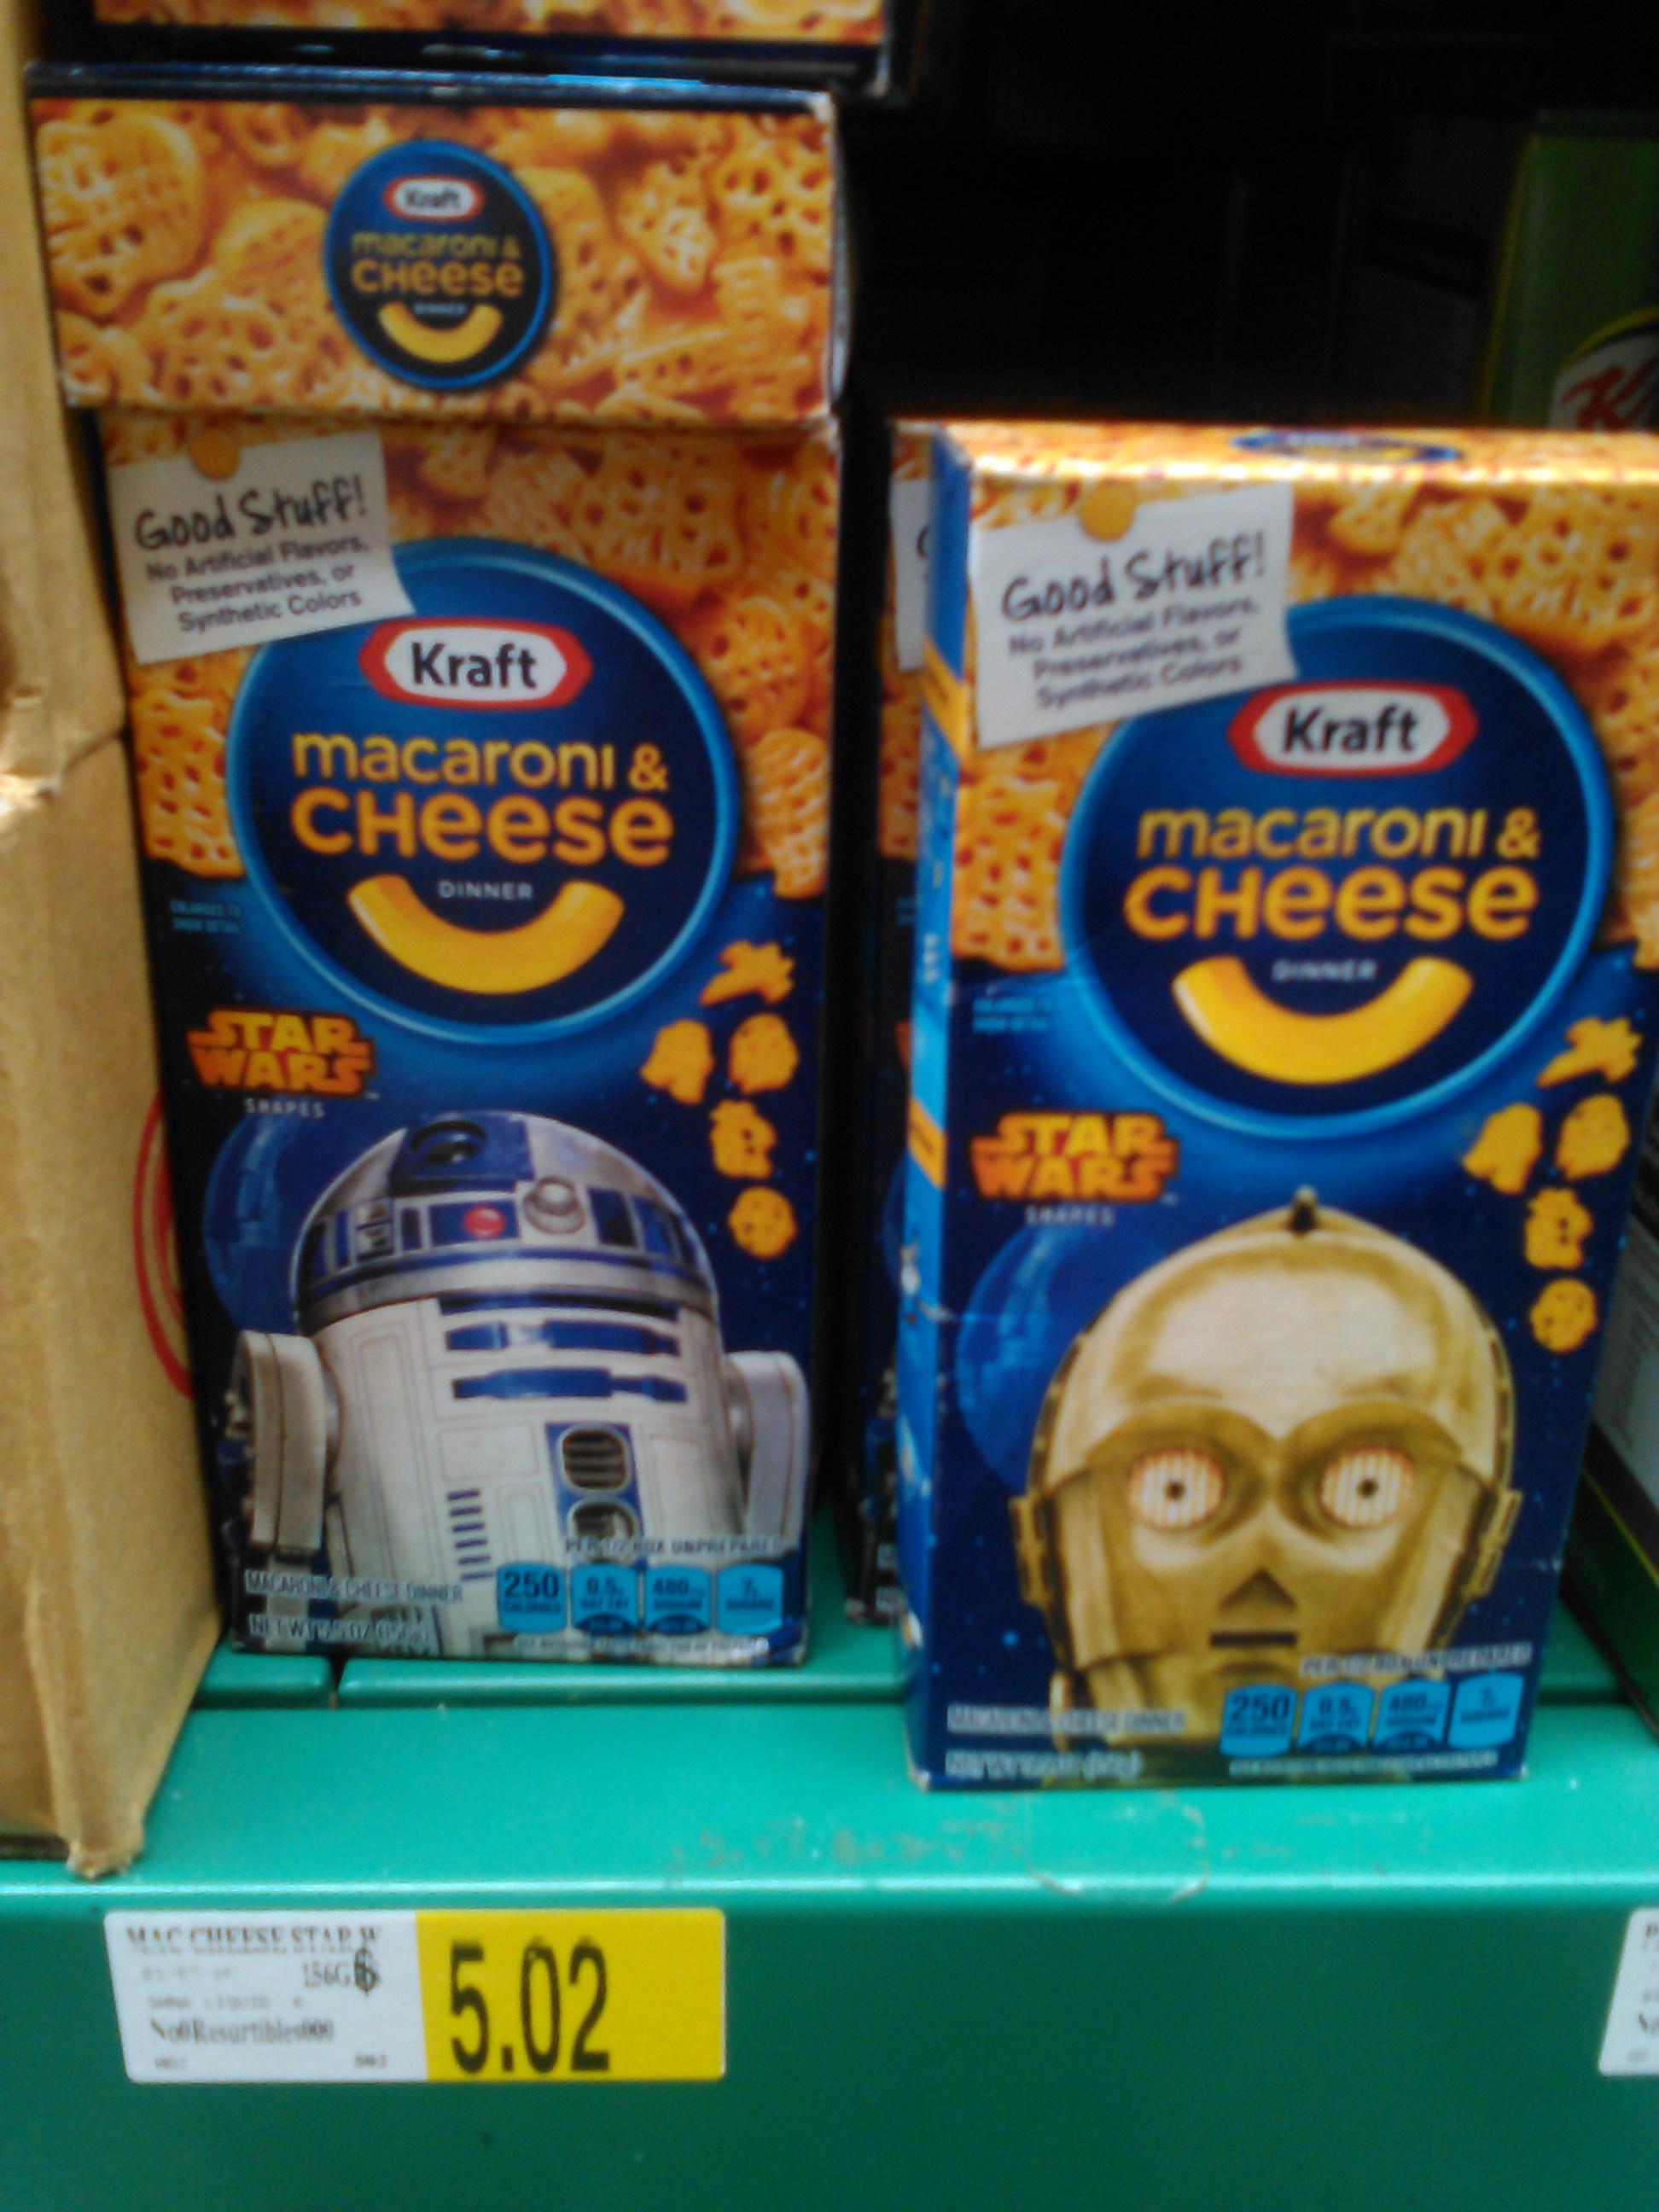 Bodega Aurrerá: pasta con queso instantánea Star Wars a $5.02